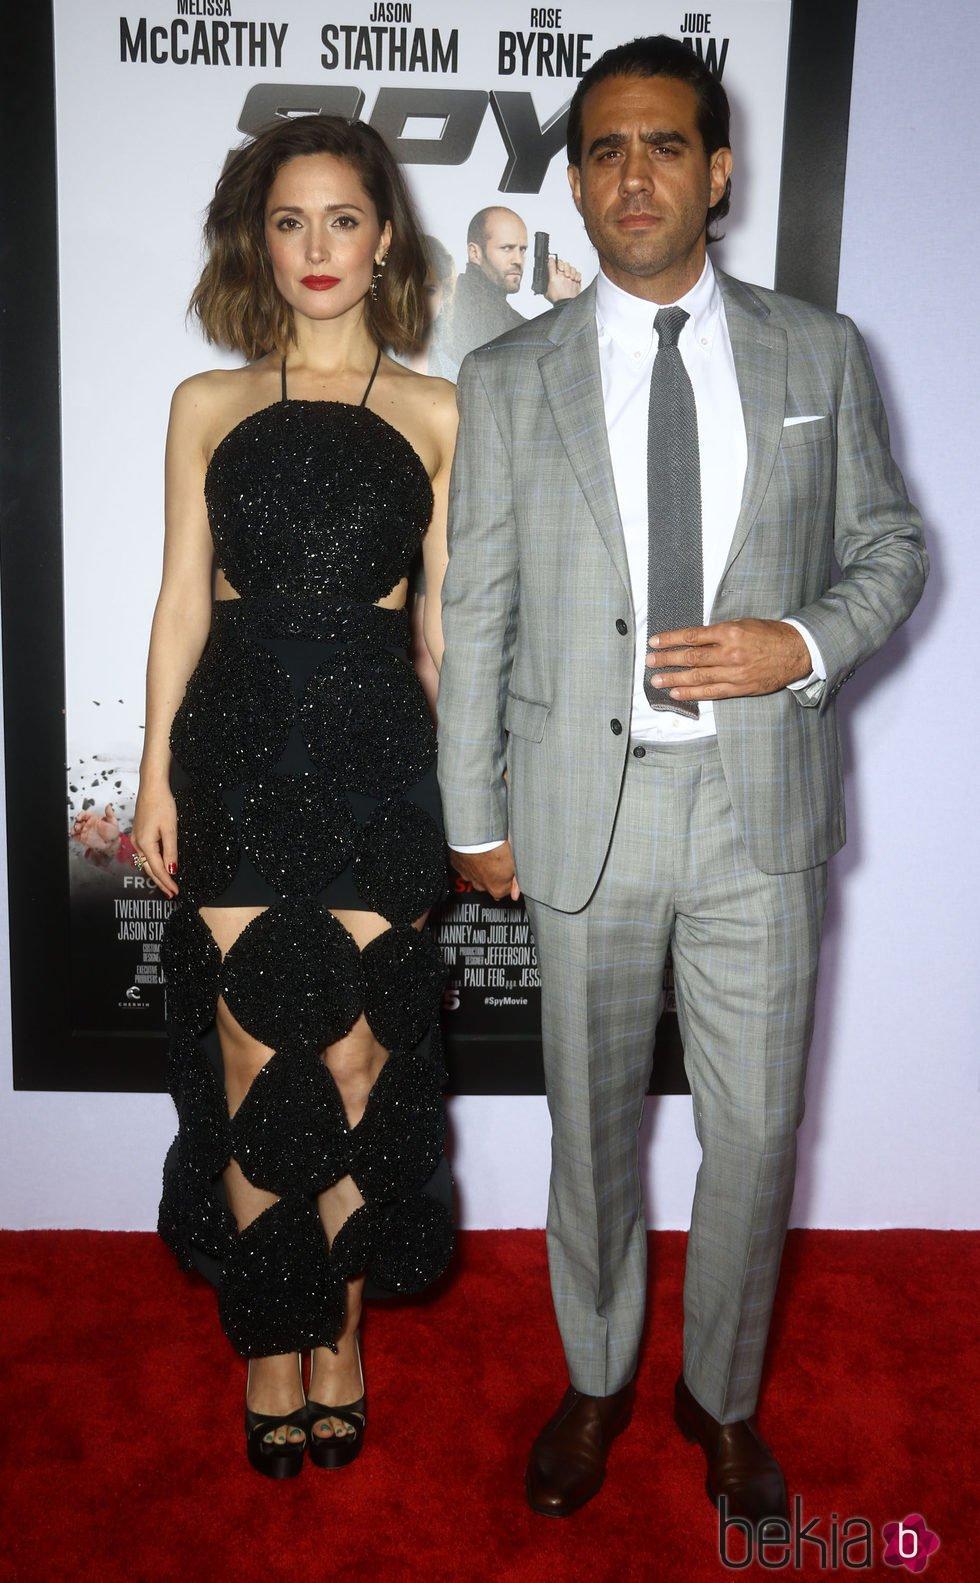 Rose Byrne y su pareja, Bobby Cannavale